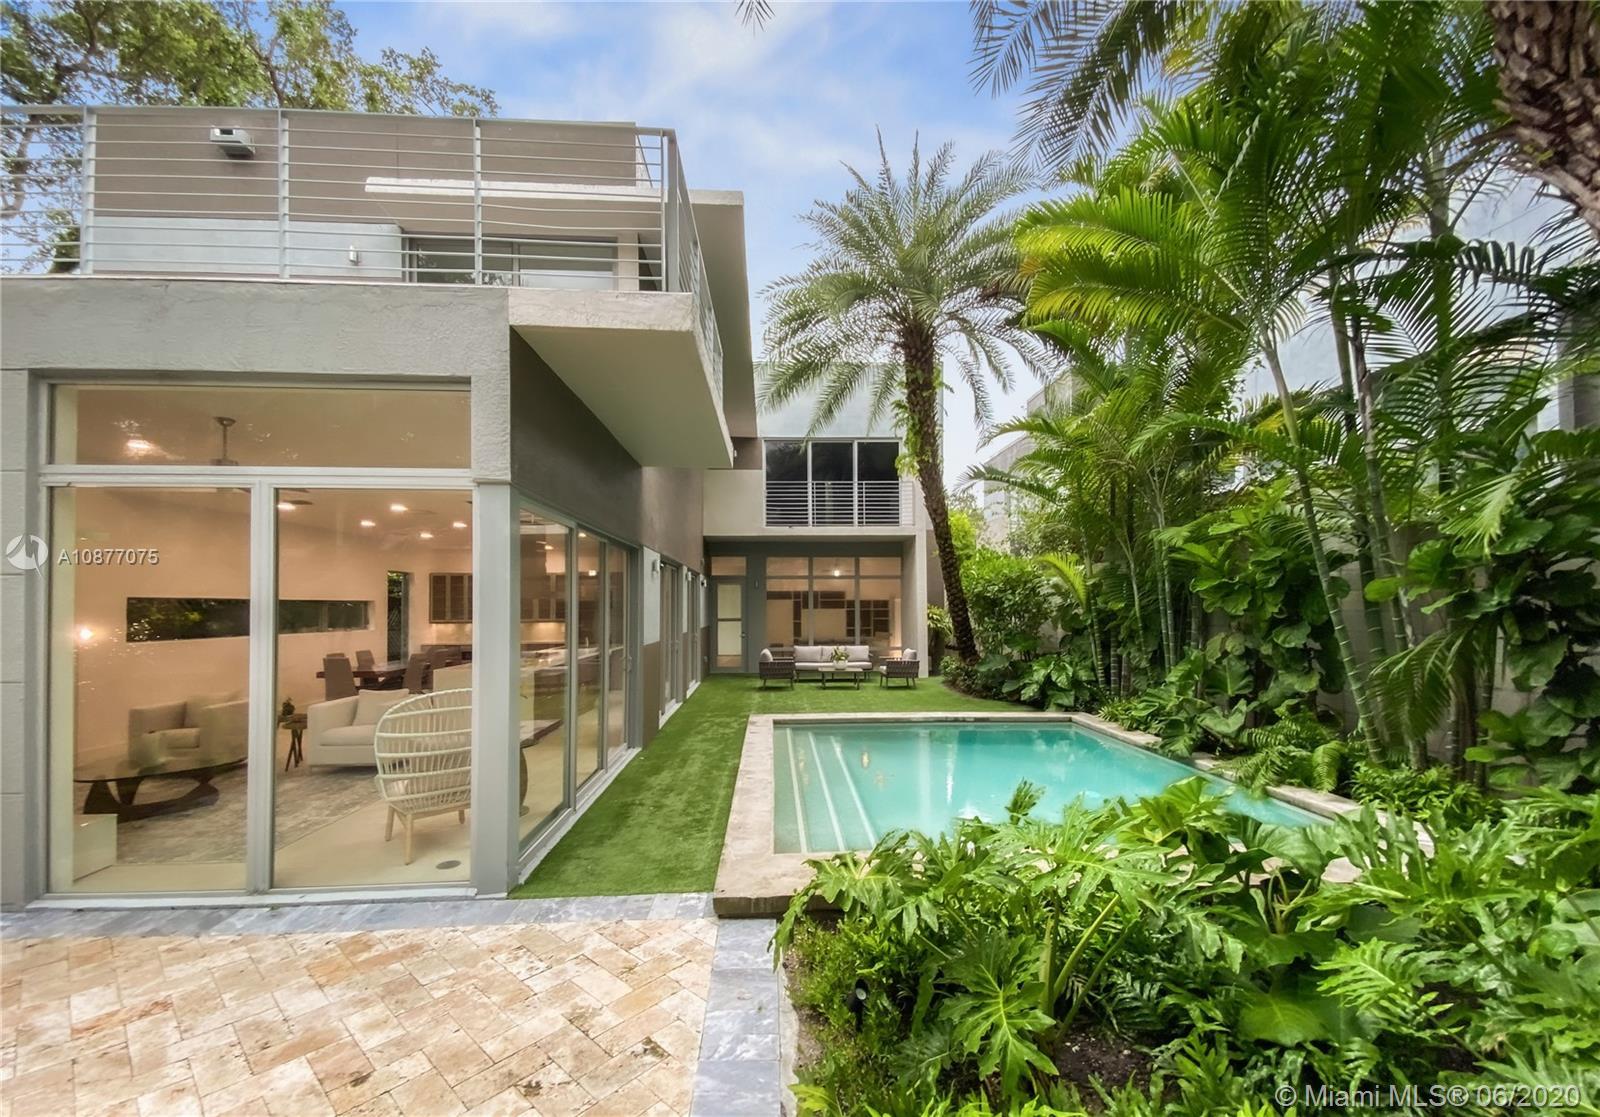 2259 Tequesta Ln, Miami, Florida 33133, 4 Bedrooms Bedrooms, ,4 BathroomsBathrooms,Residential,For Sale,2259 Tequesta Ln,A10877075